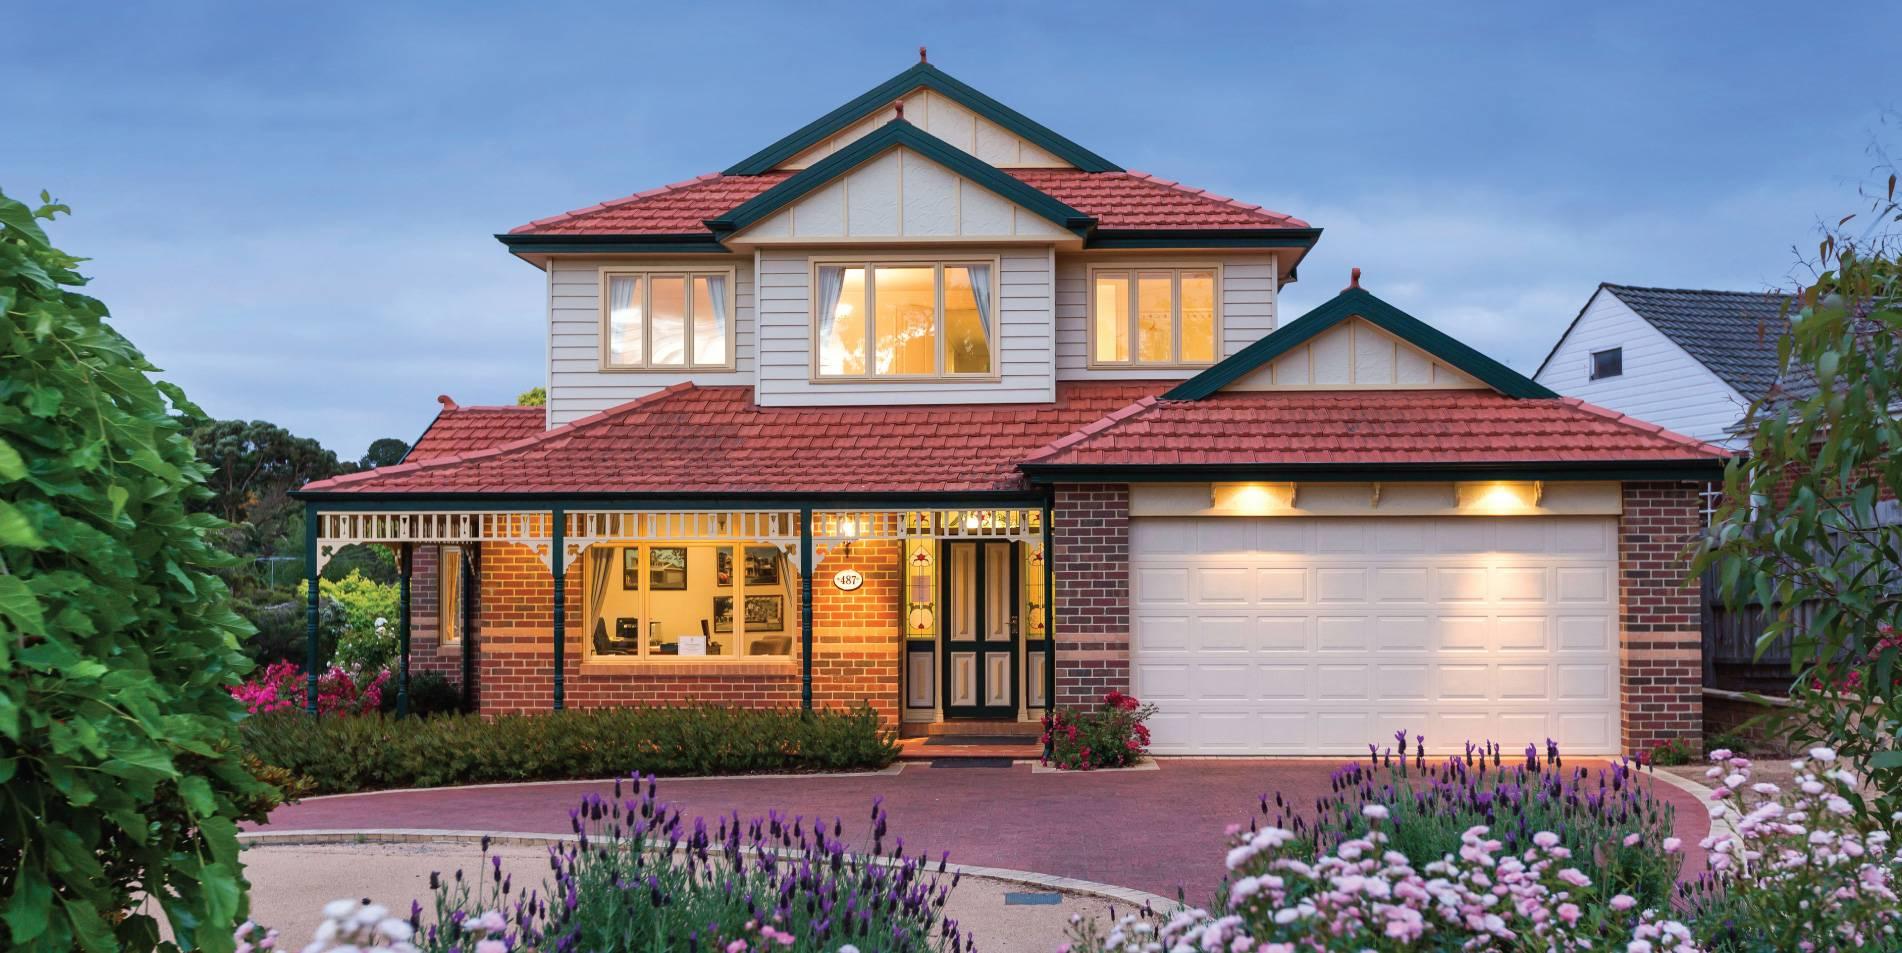 Australian Federation House Designs - House Plans | #160793